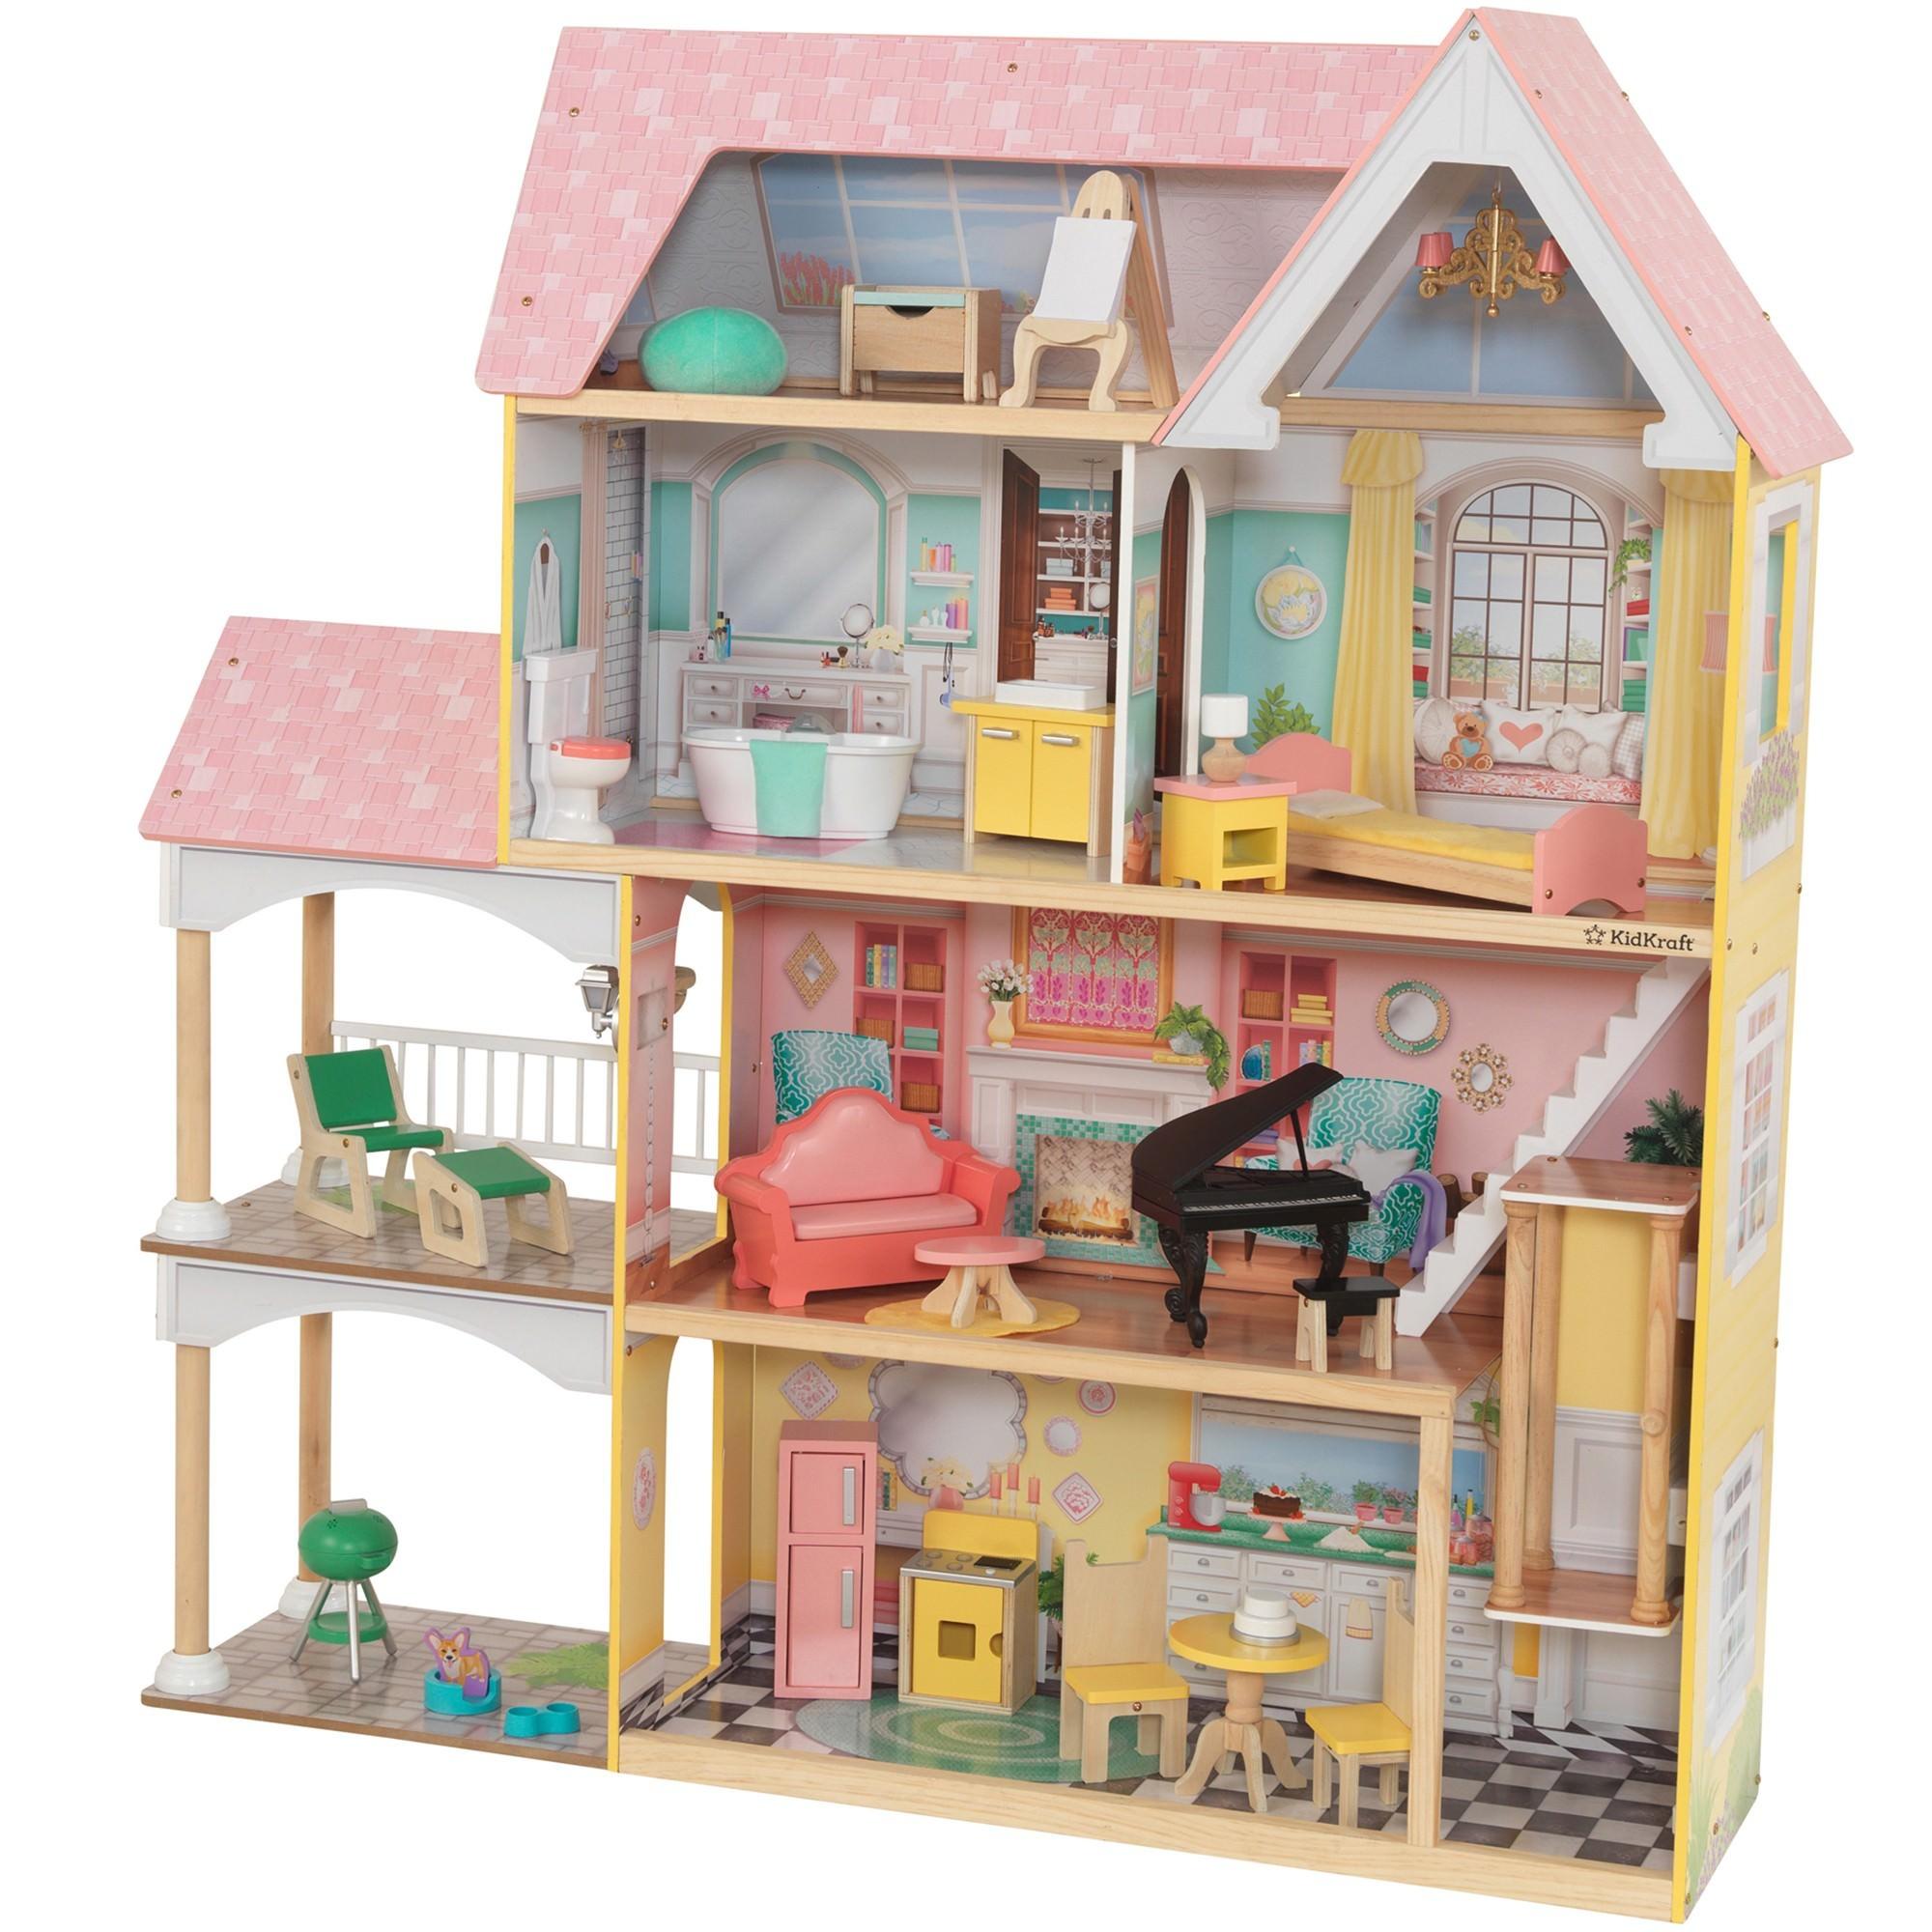 KidKraft Lola Mansion Dollhouse with EZ Kraft Assembly